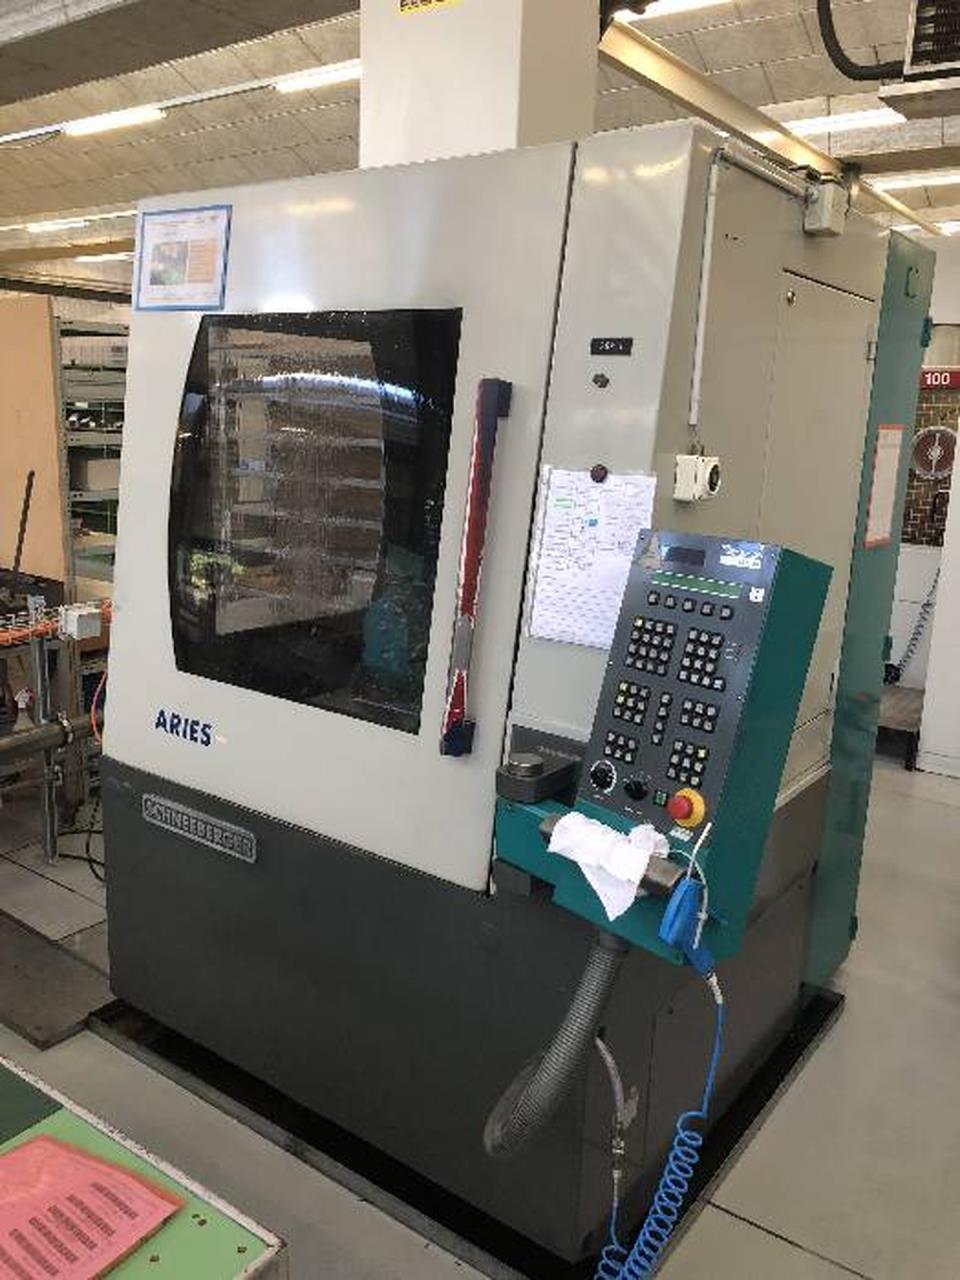 Schneeberger Aries Nc Tool Grinding Machine Exapro